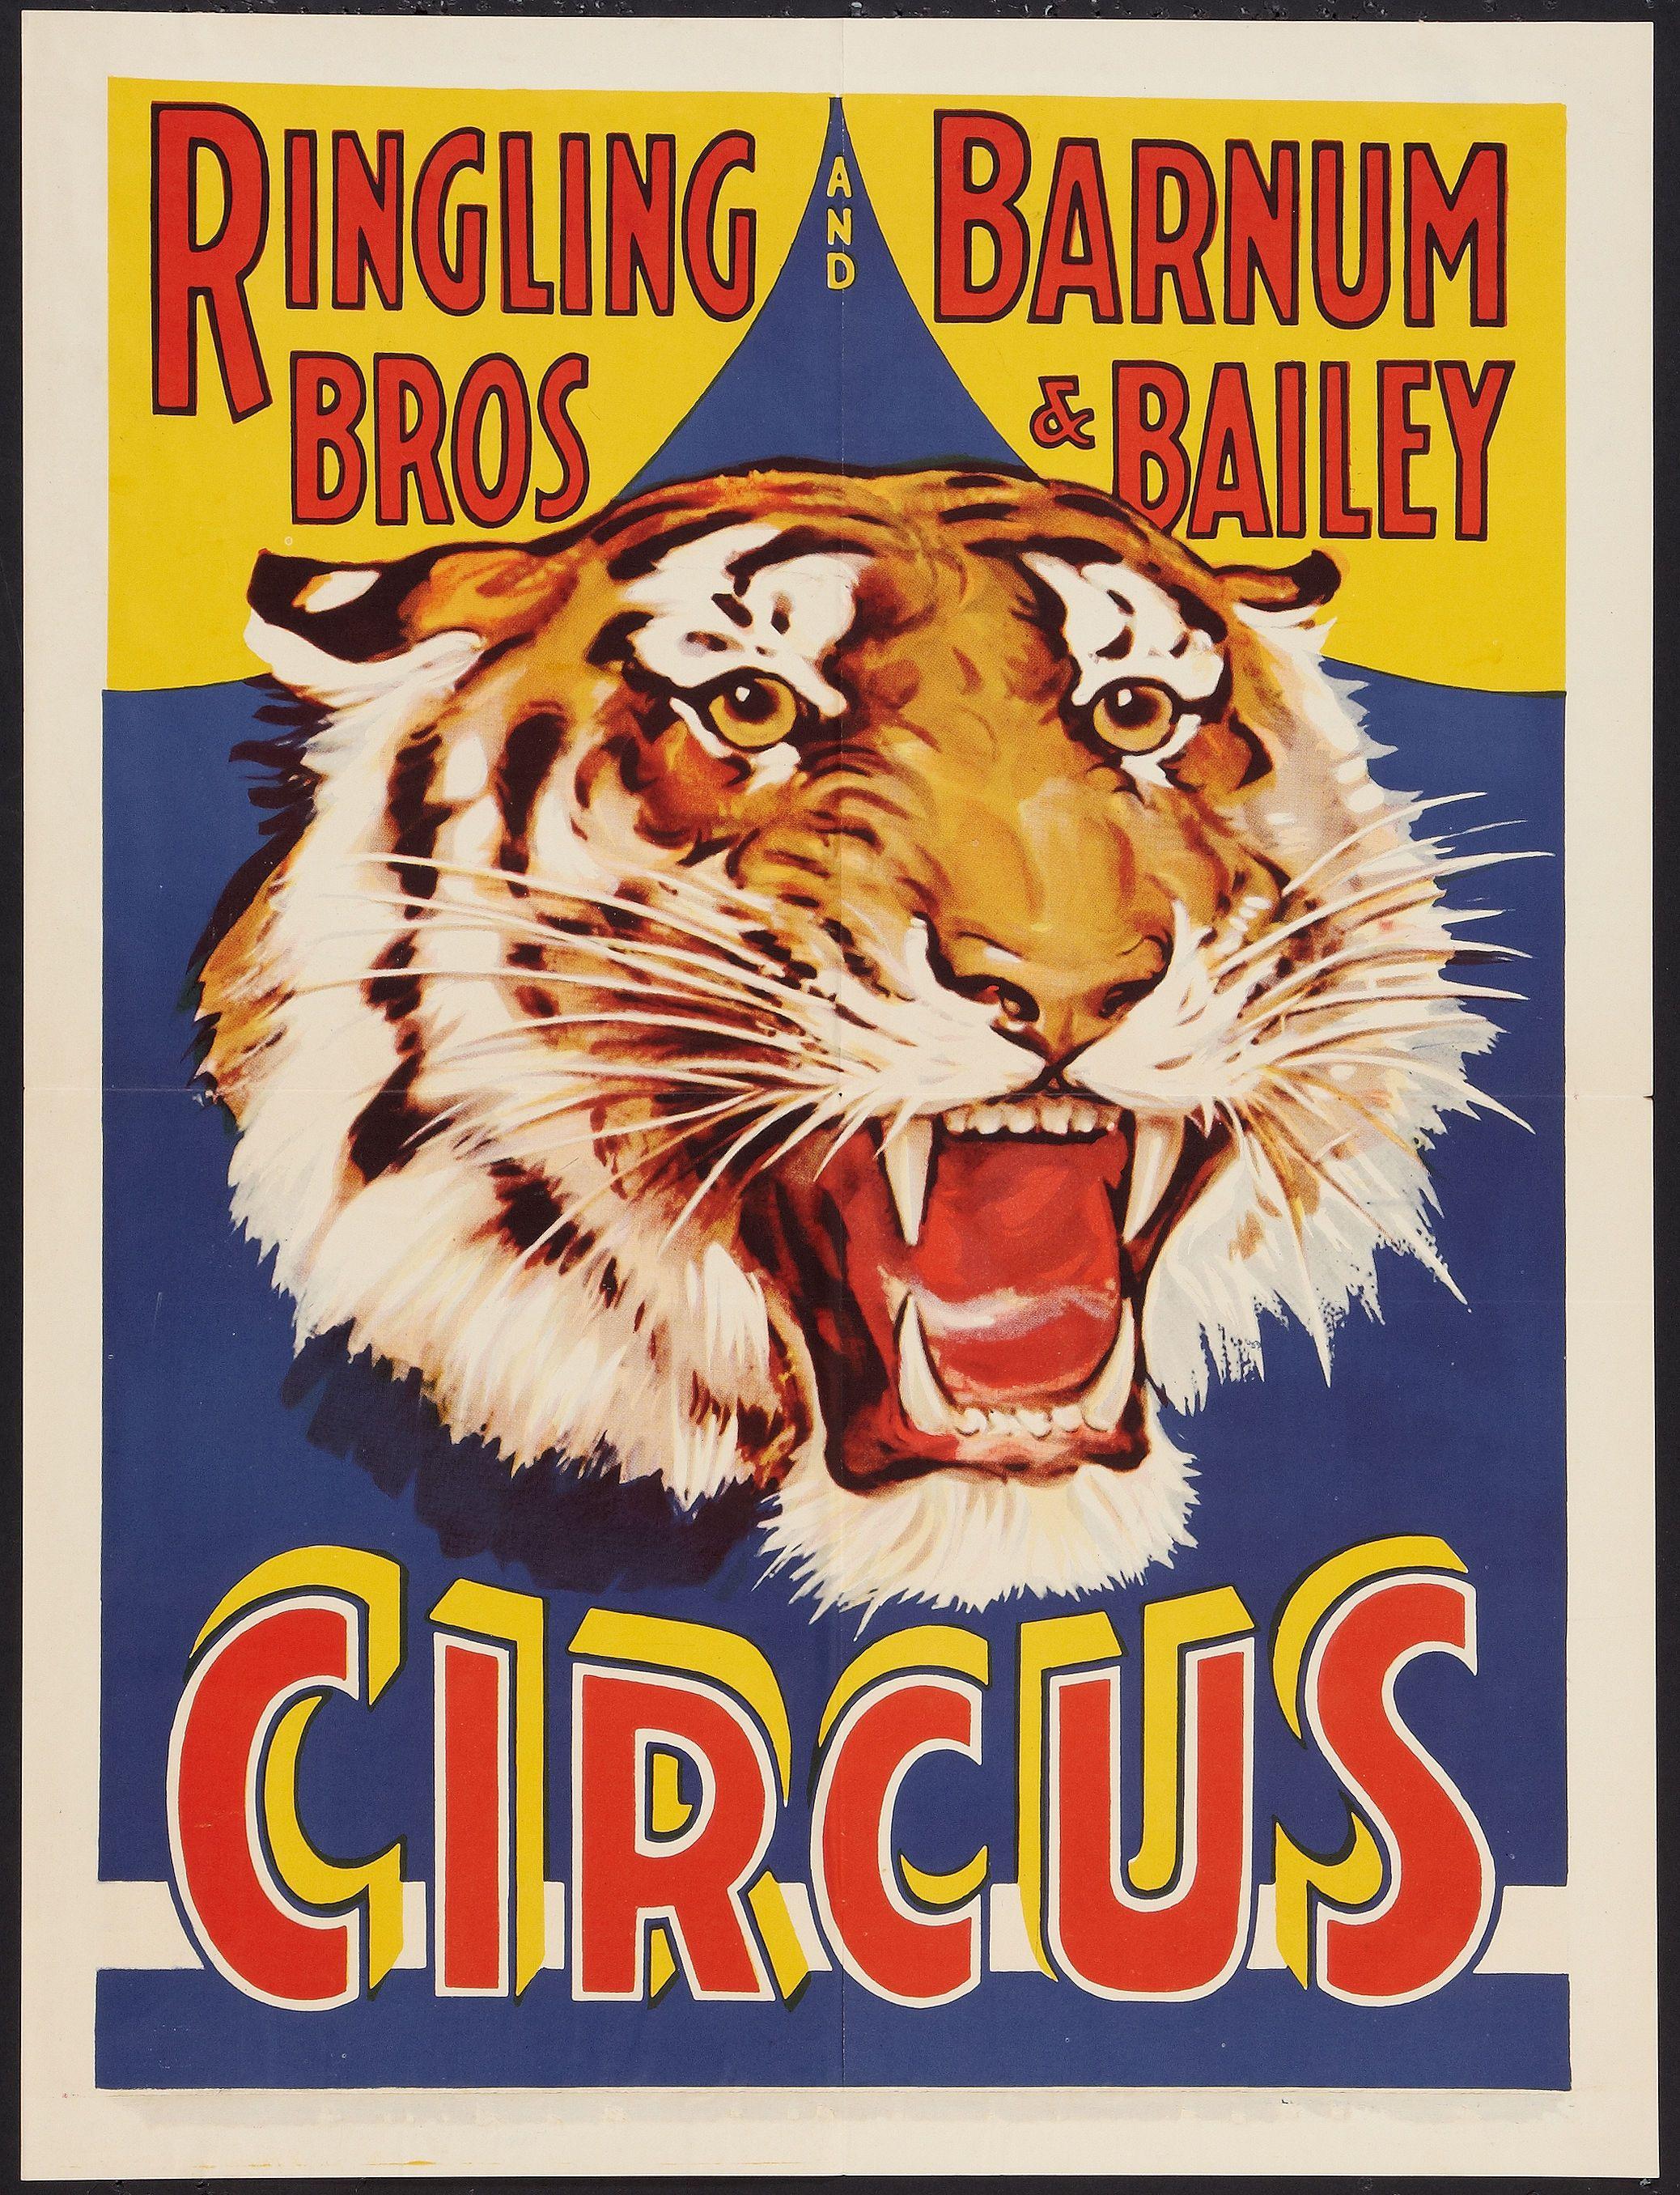 Ringling Bros. & Barnum Bailey Circus Poster